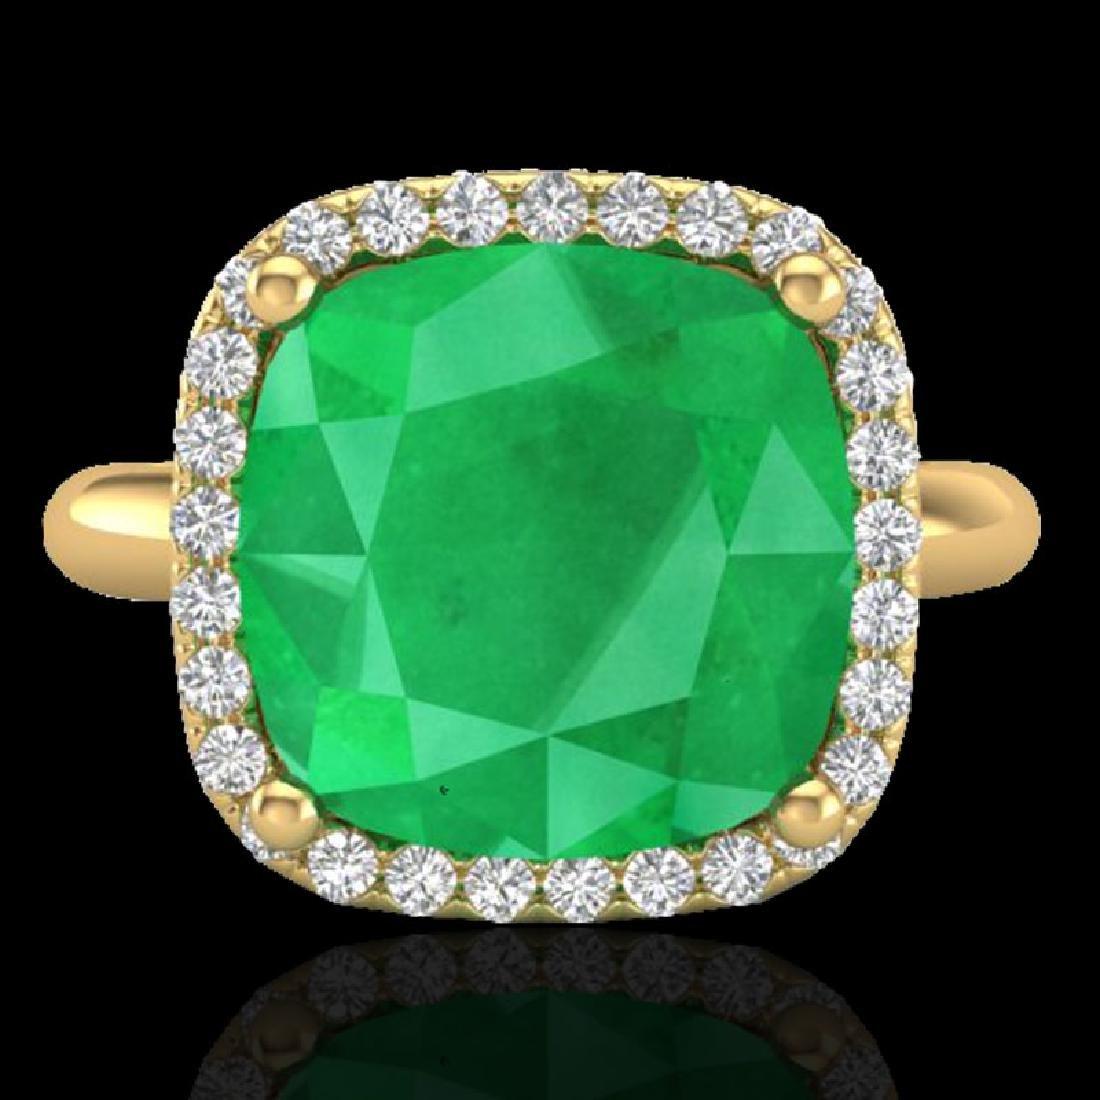 6 CTW Emerald And Micro Pave Halo VS/SI Diamond Ring